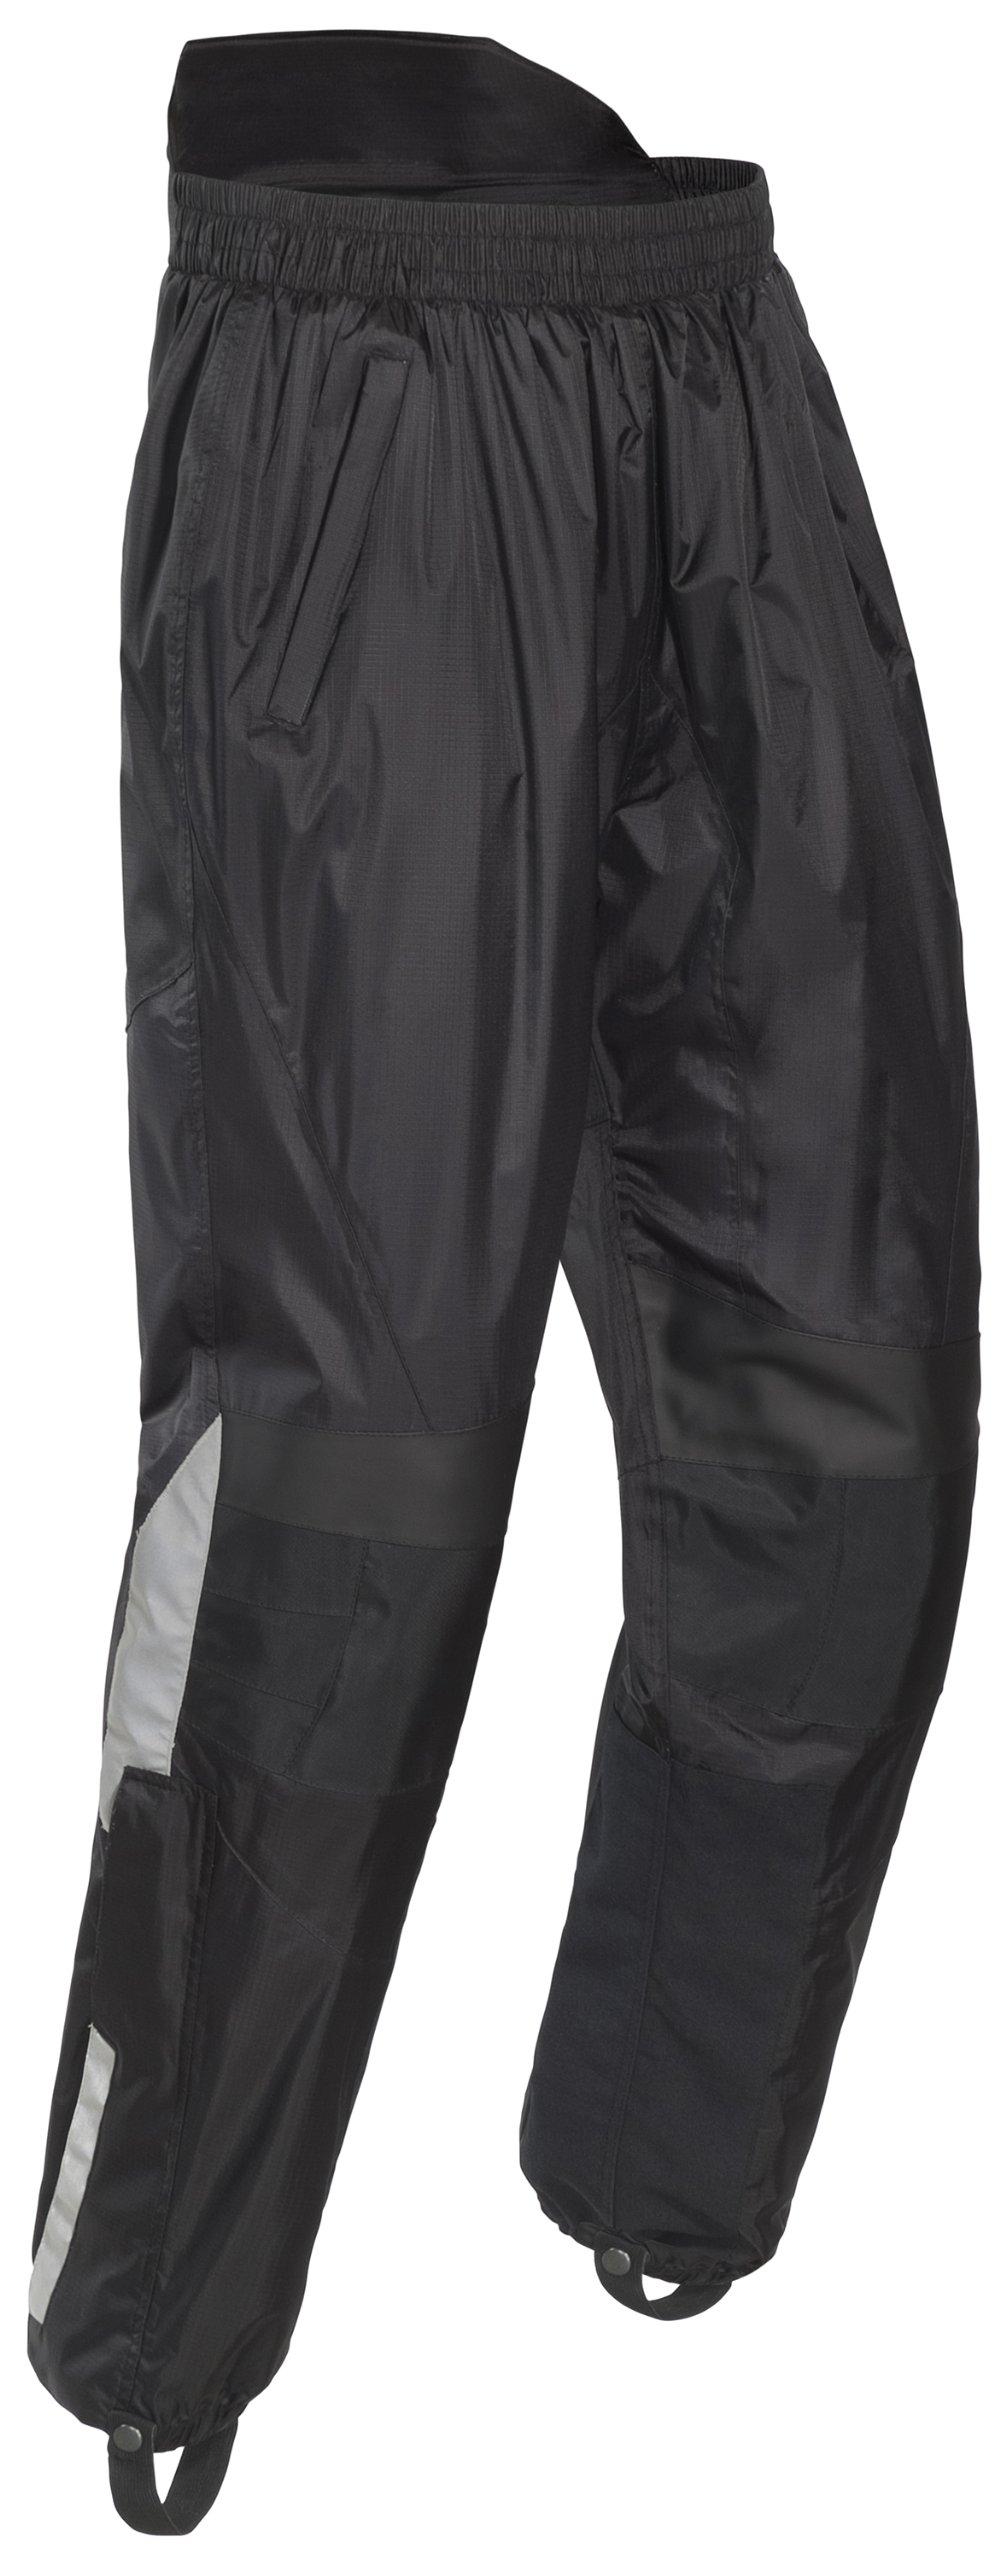 Tourmaster Sentinel 2.0 Rainsuit Pants (Medium, Black w/ Nomex)